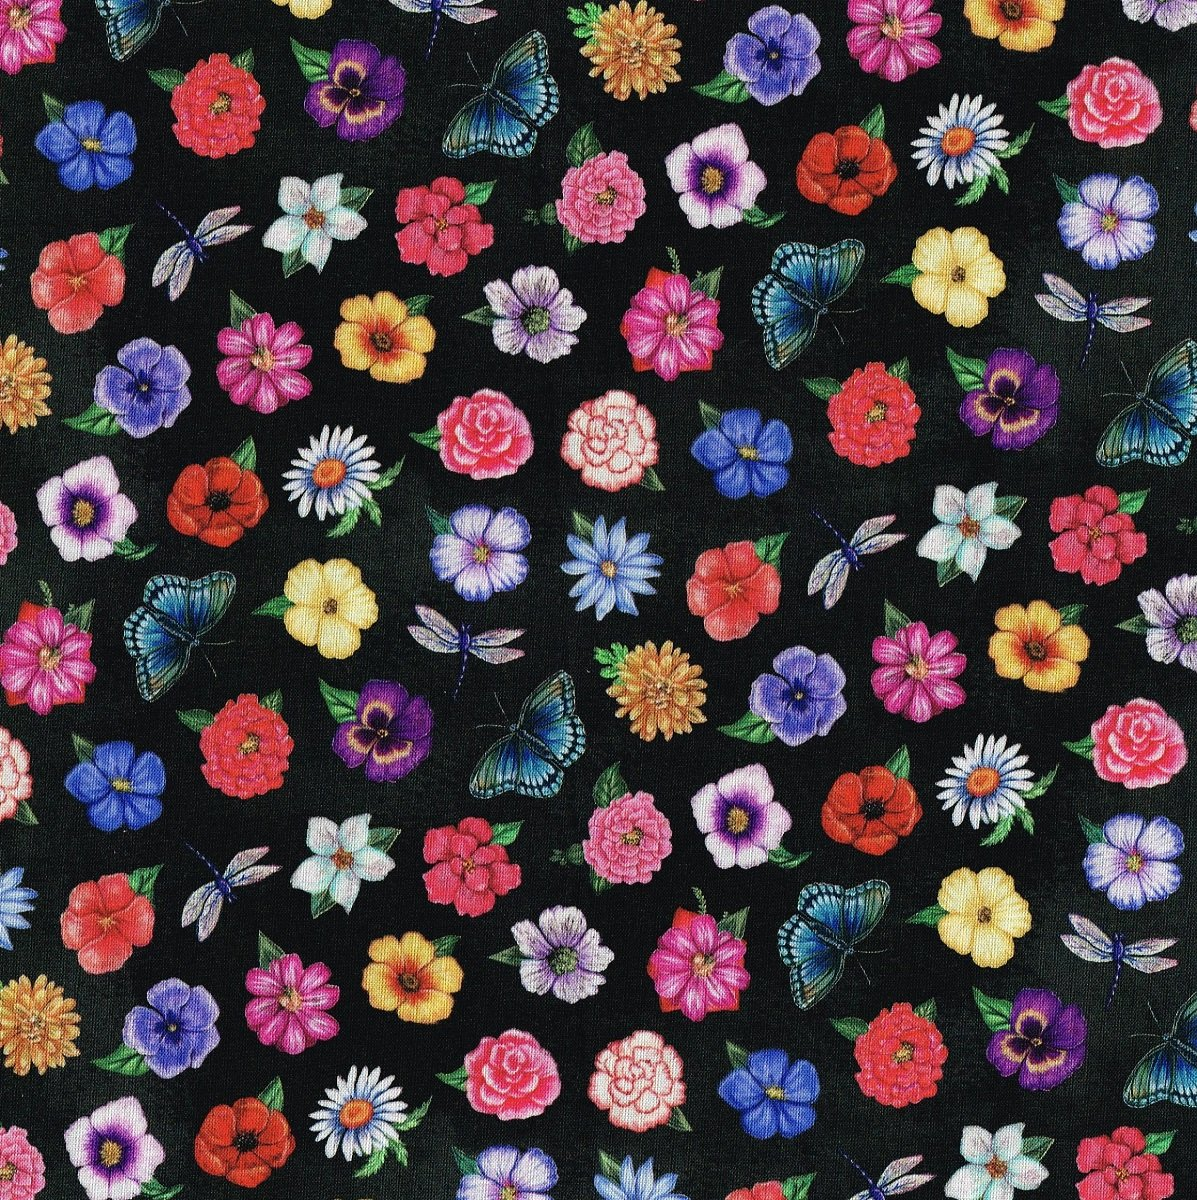 Floral Medley NC 21788-99 Black